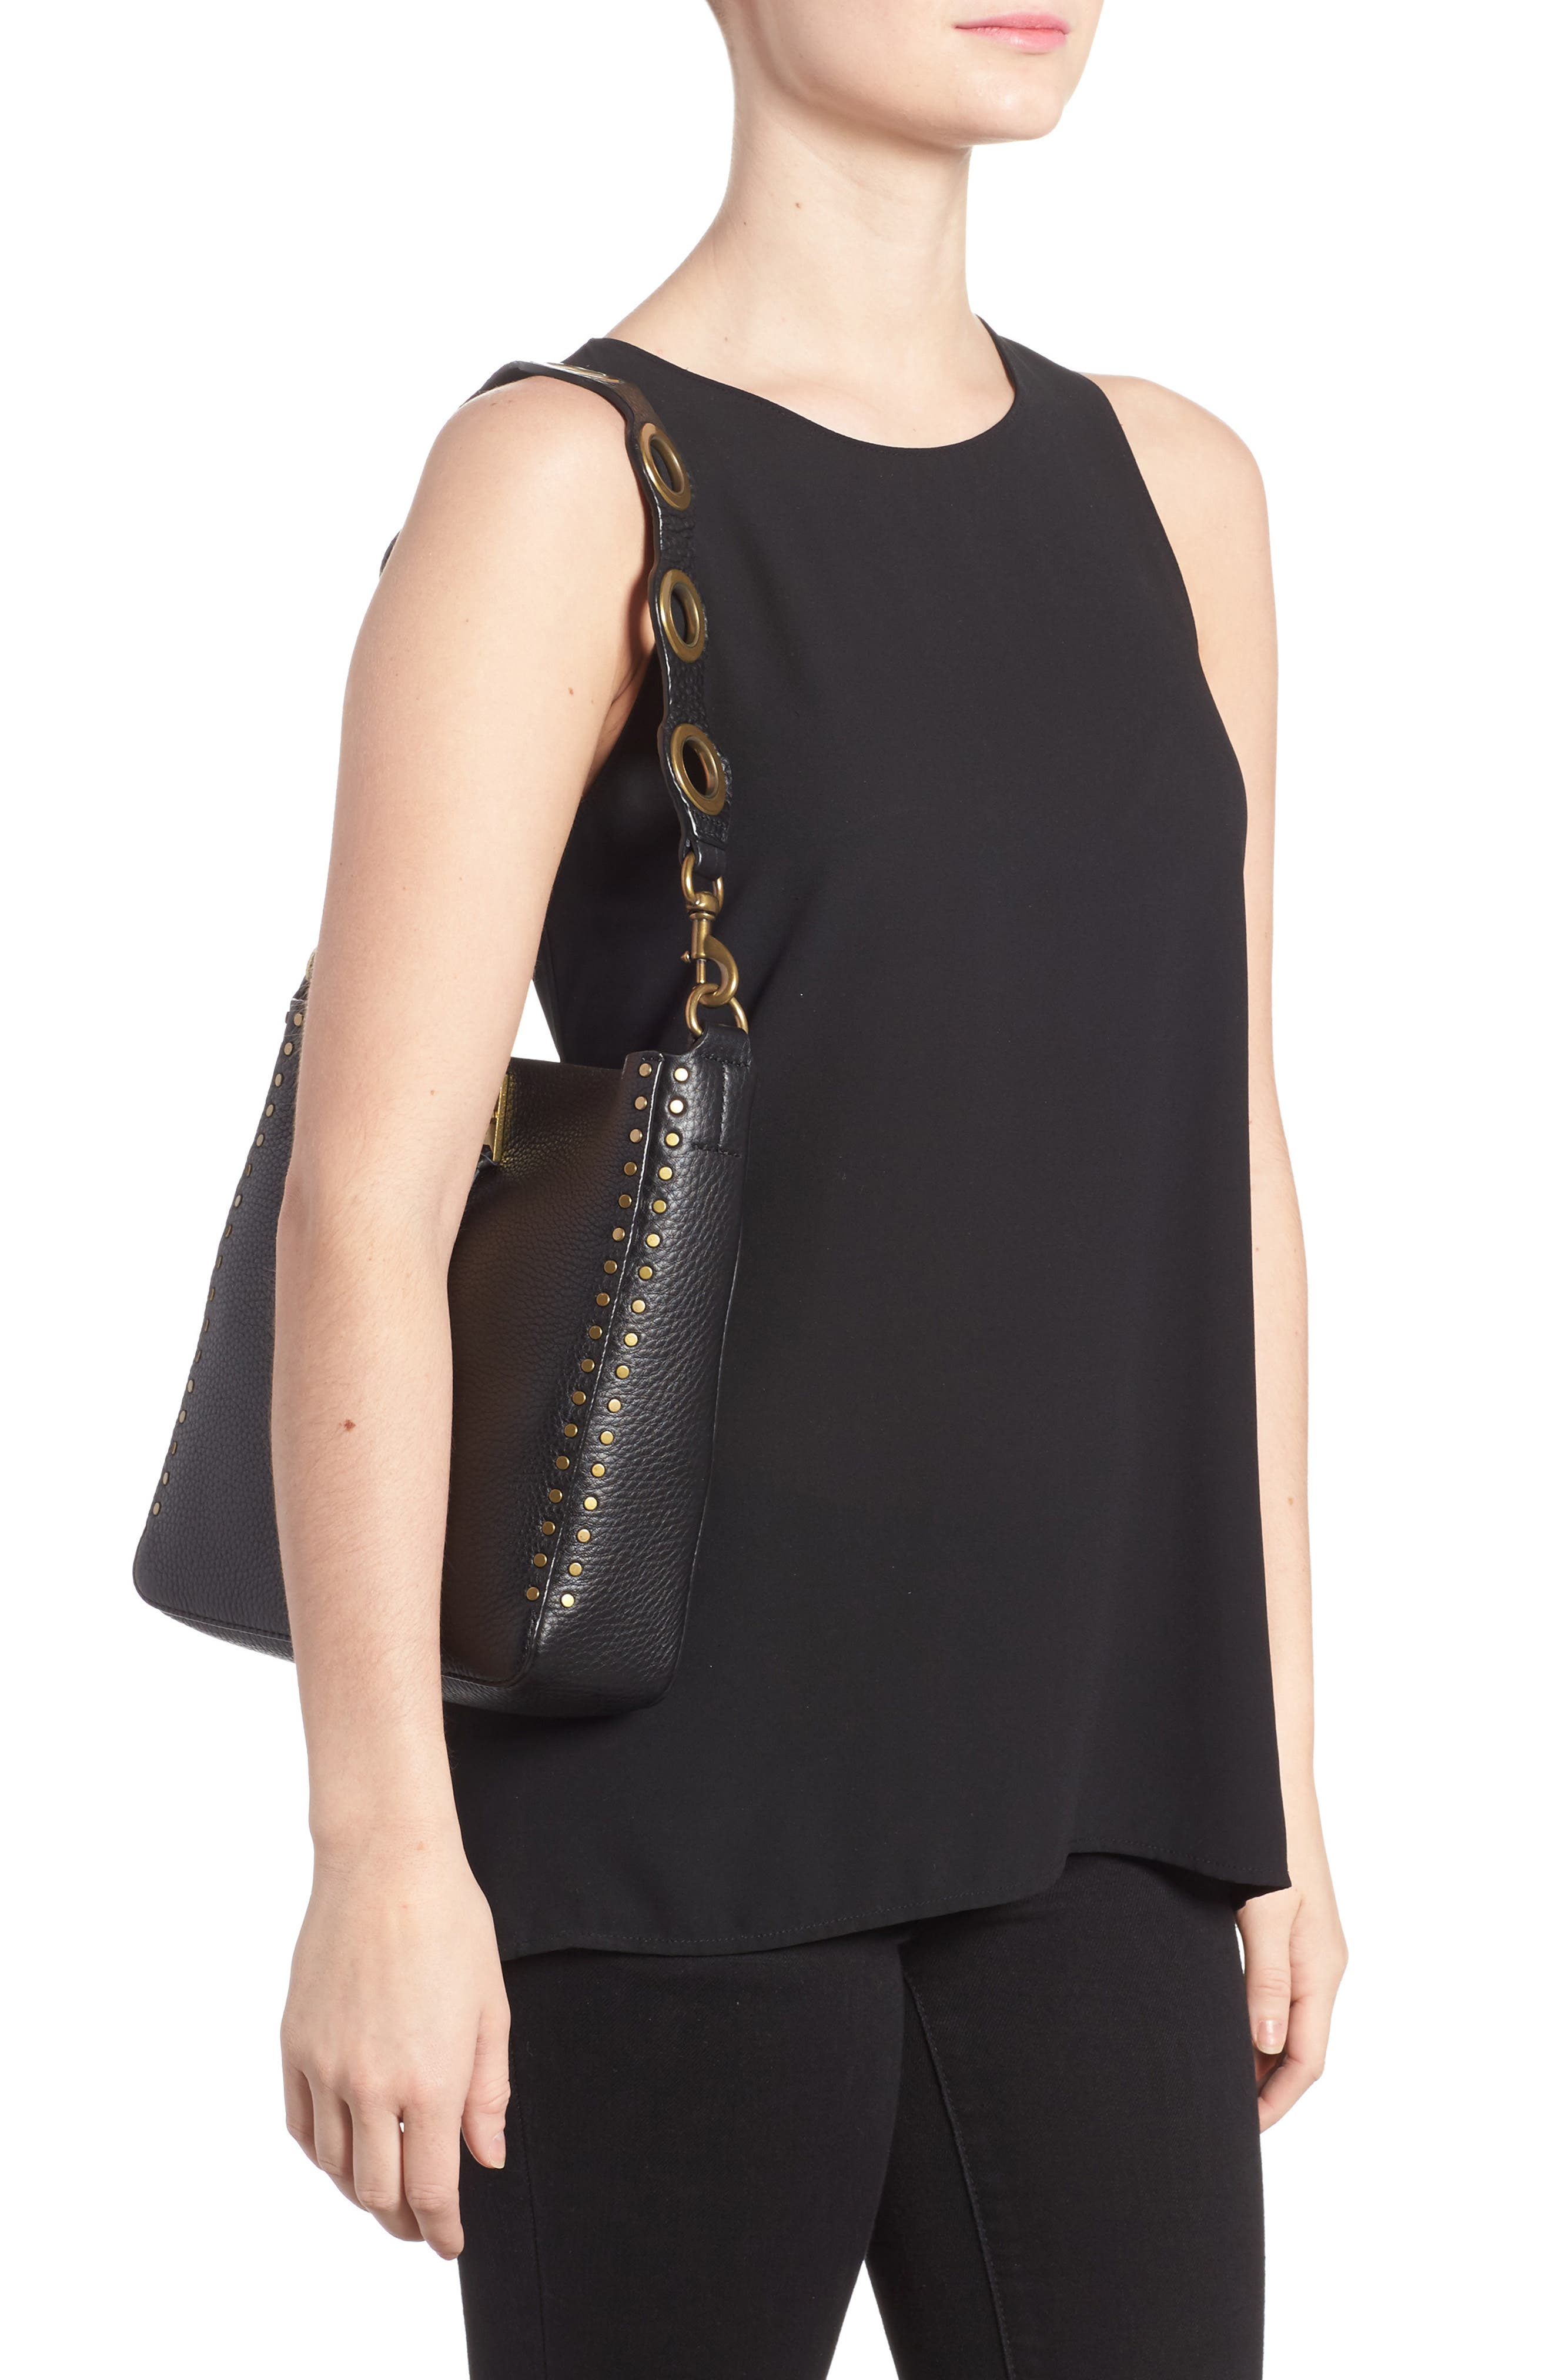 REBECCA MINKOFF, Small Darren Deerskin Leather Feed Bag, Alternate thumbnail 2, color, BLACK